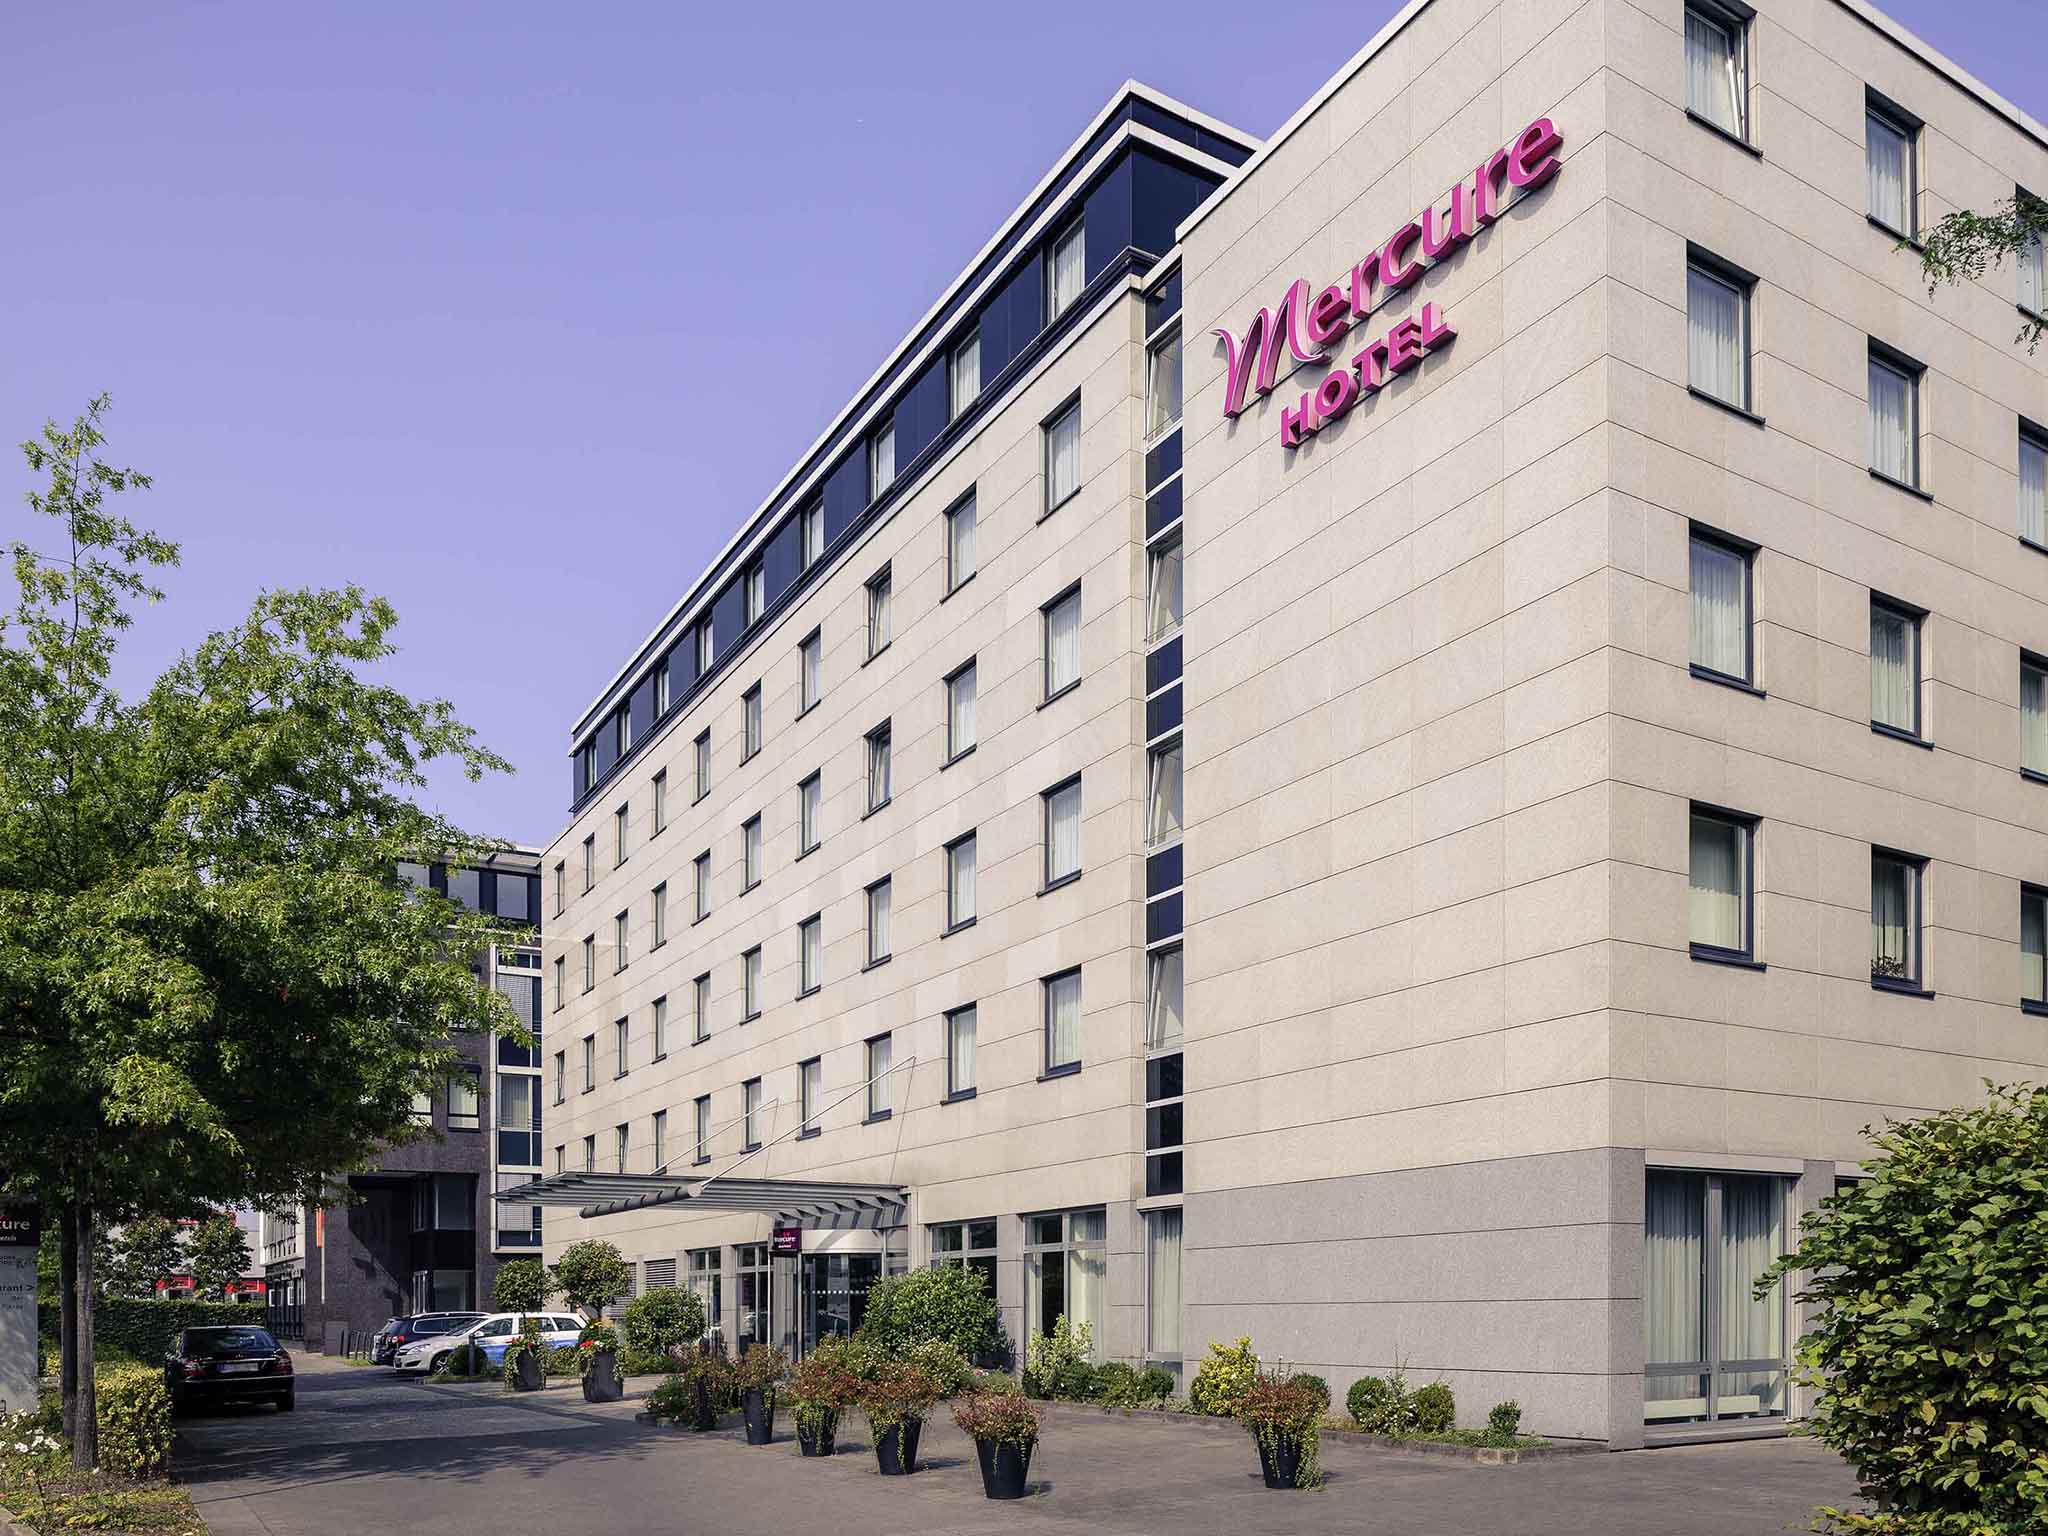 فندق - مركيور Mercure دوسلدورف سيتي نور